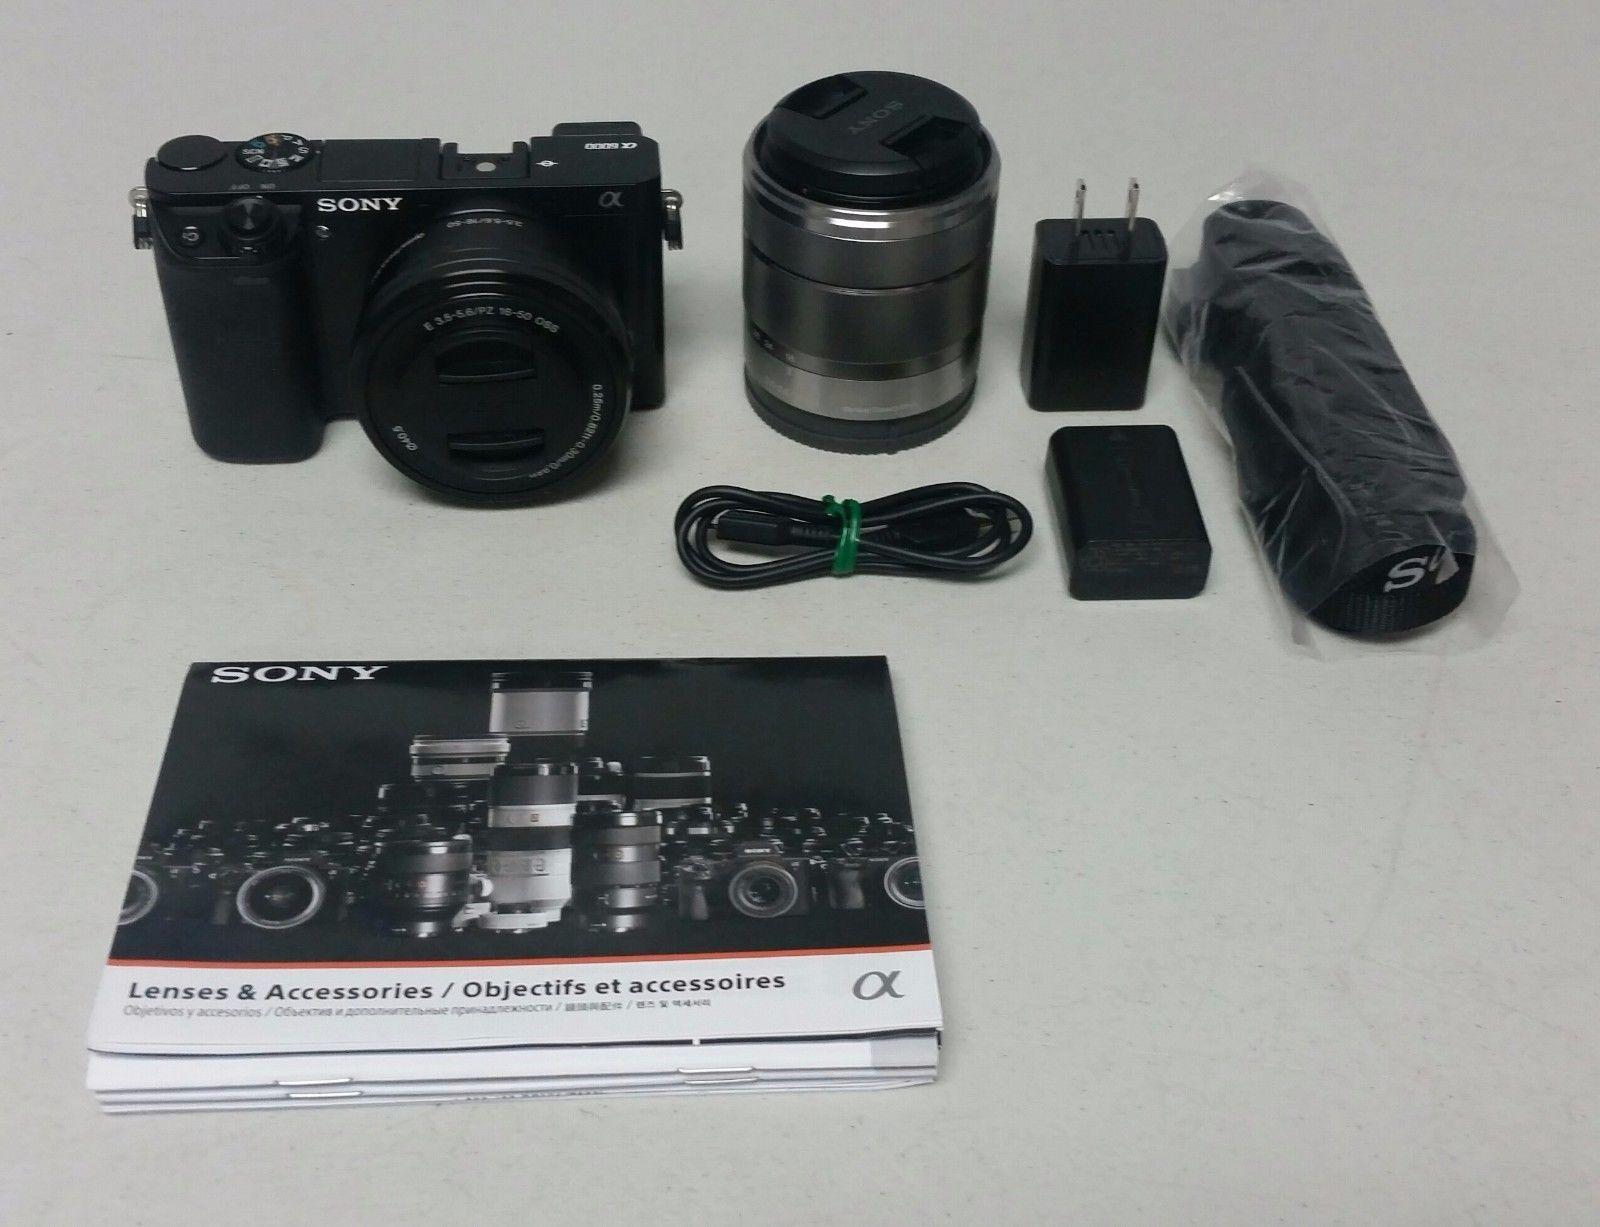 Sony A6000 Alpha 6000 Ilce 6000l Digital Camera 16 50mm Lens W Sony Sel1855 368 00 17 Bids End Date Thursday Aug 31 2 Digital Camera Accessories Sony